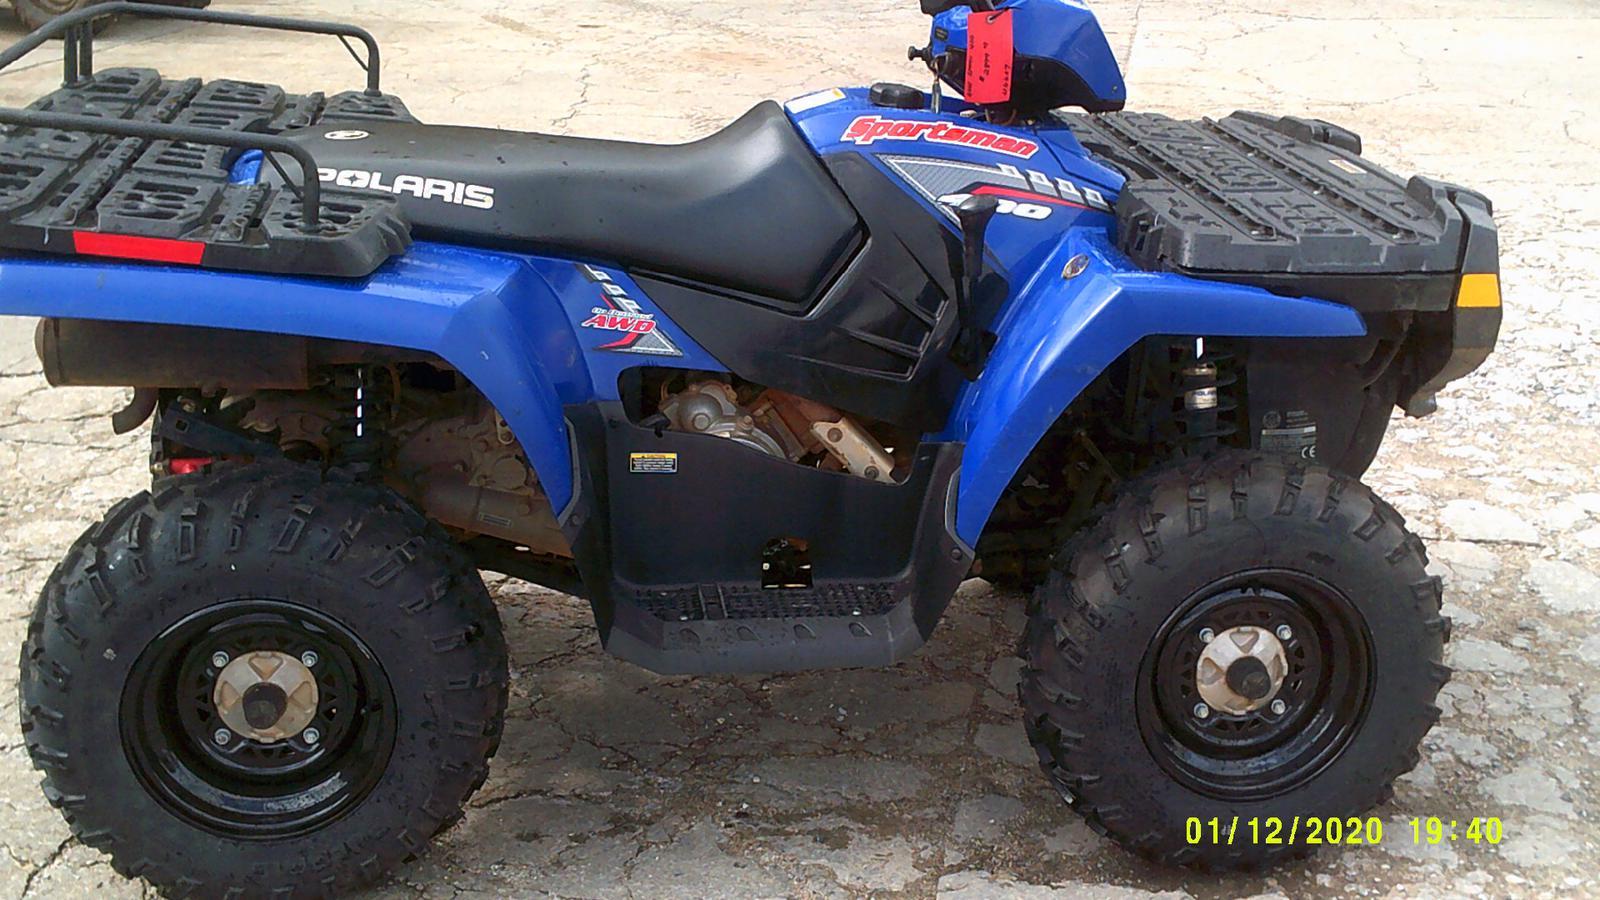 2005 Polaris Industries SPORTSMAN 400